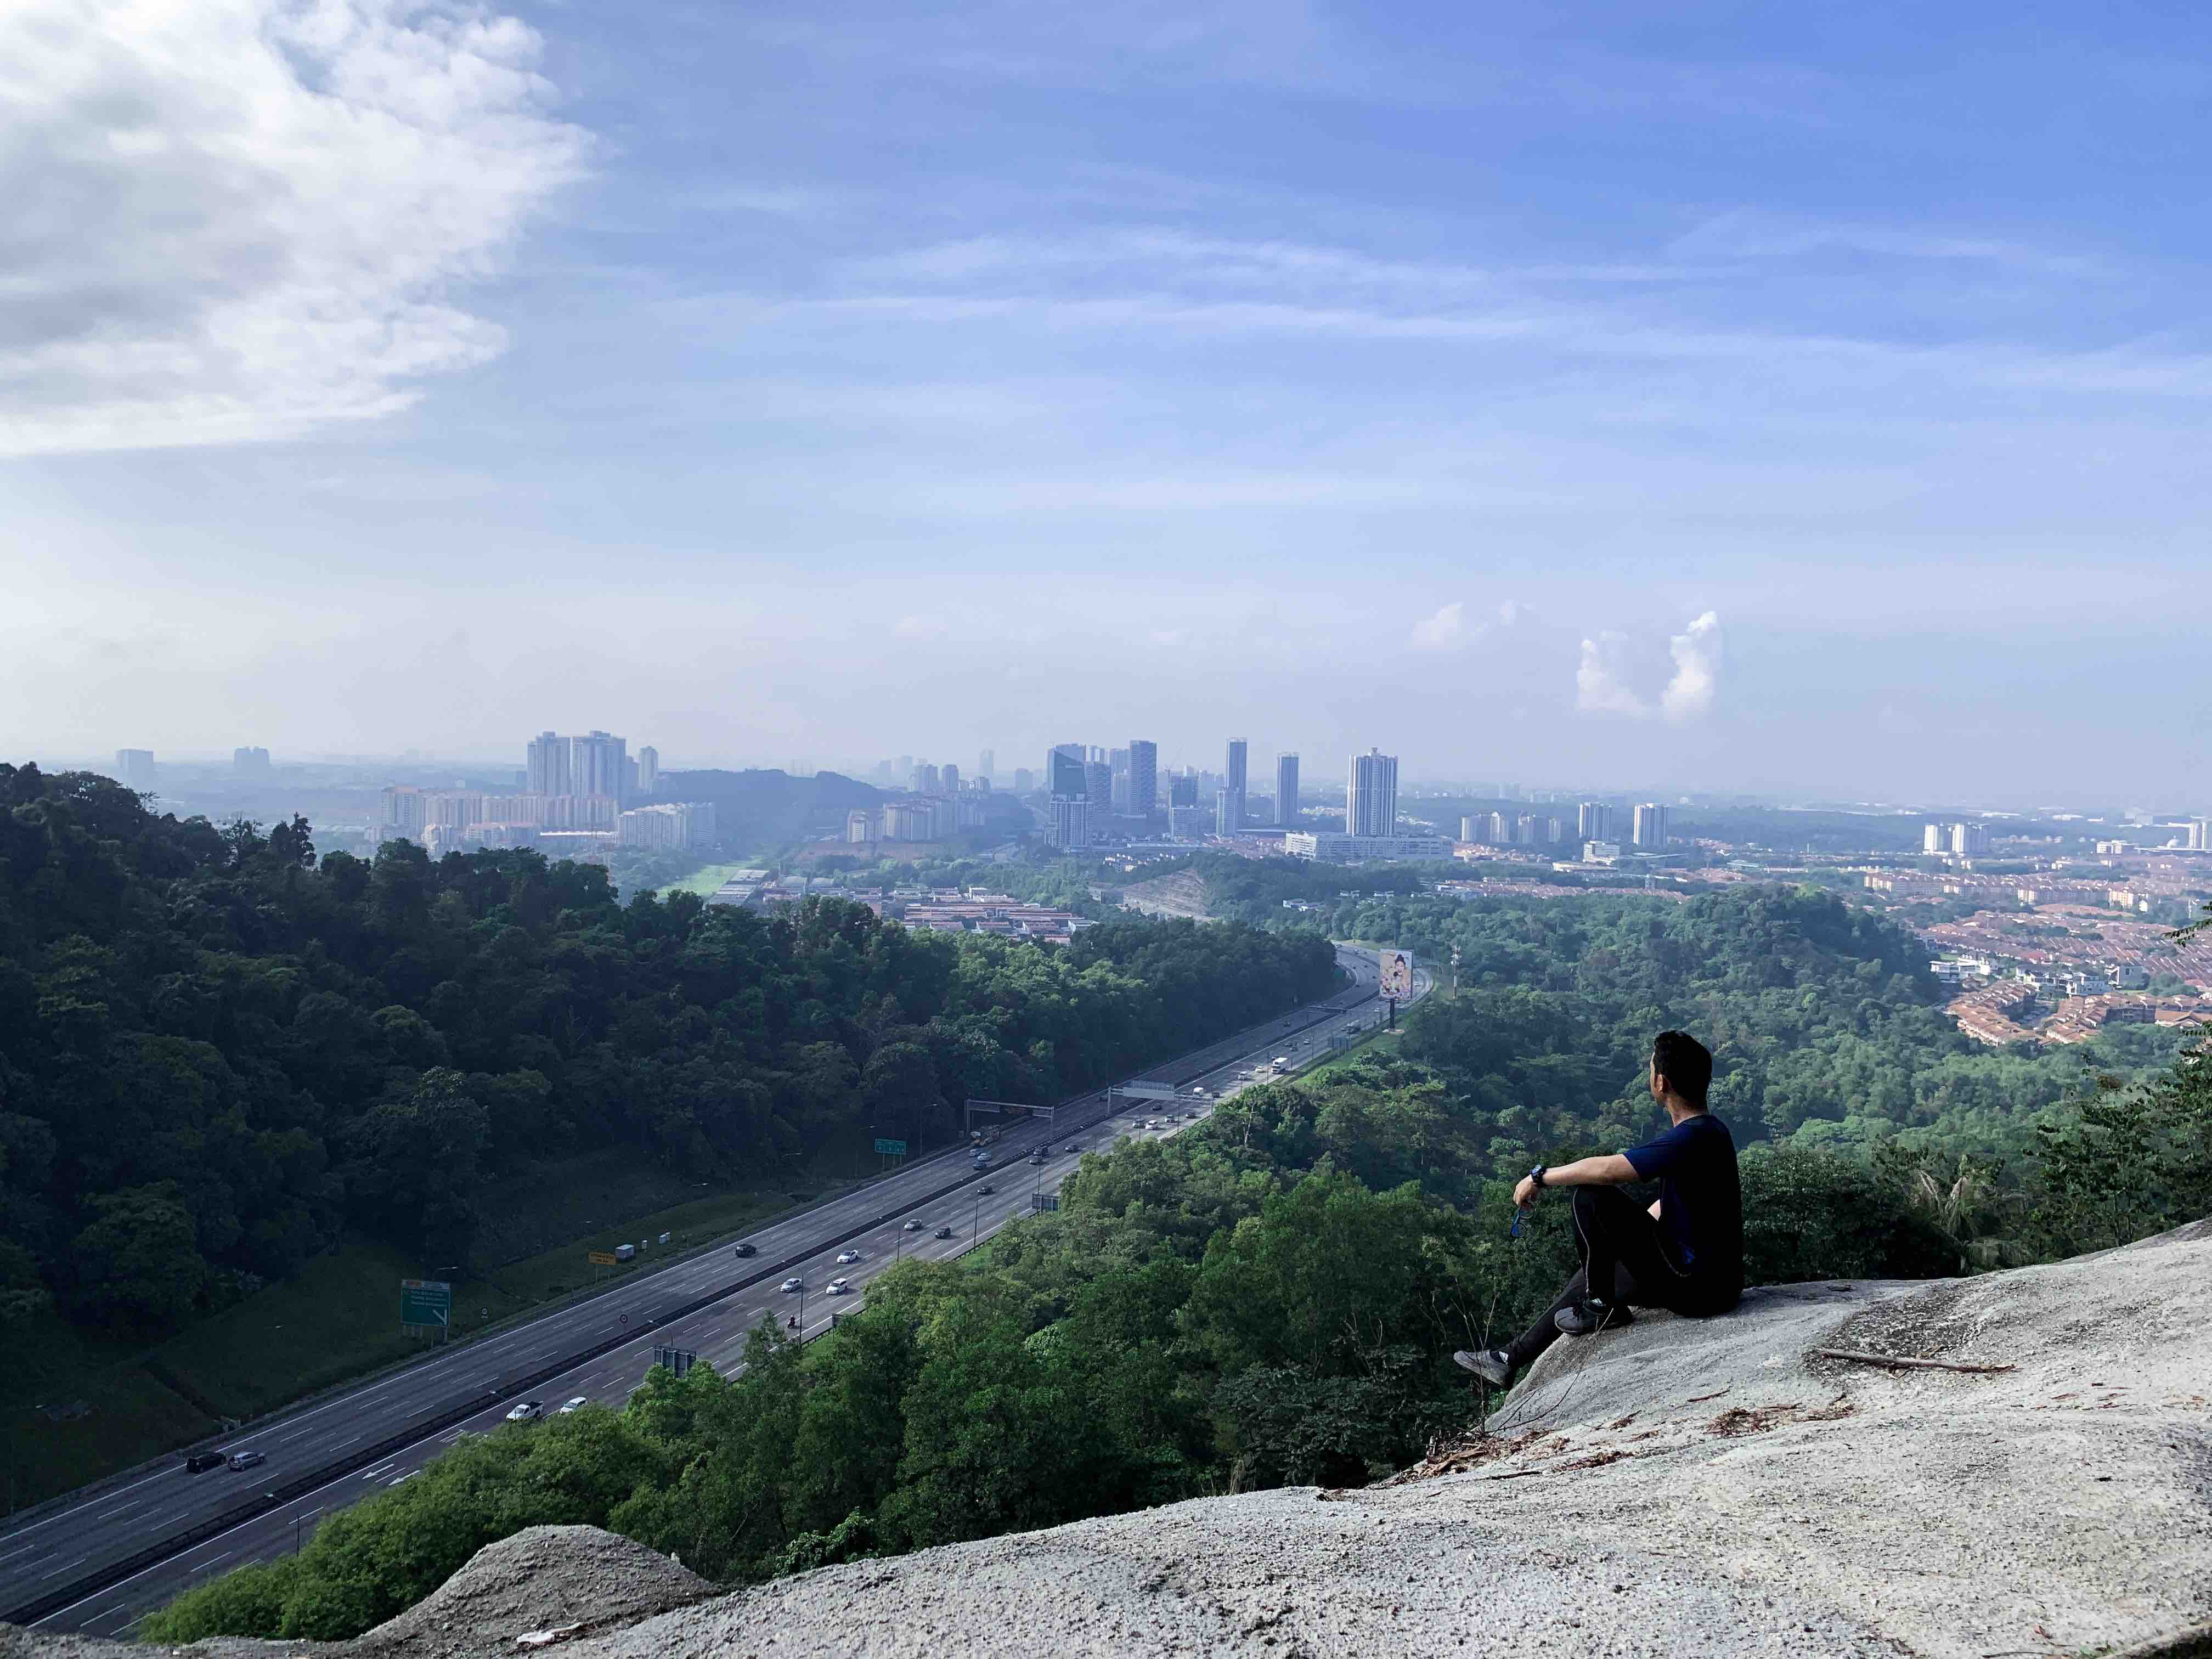 Bukit Denai Tiga Puteri Kota Damansara - Afiq Halid